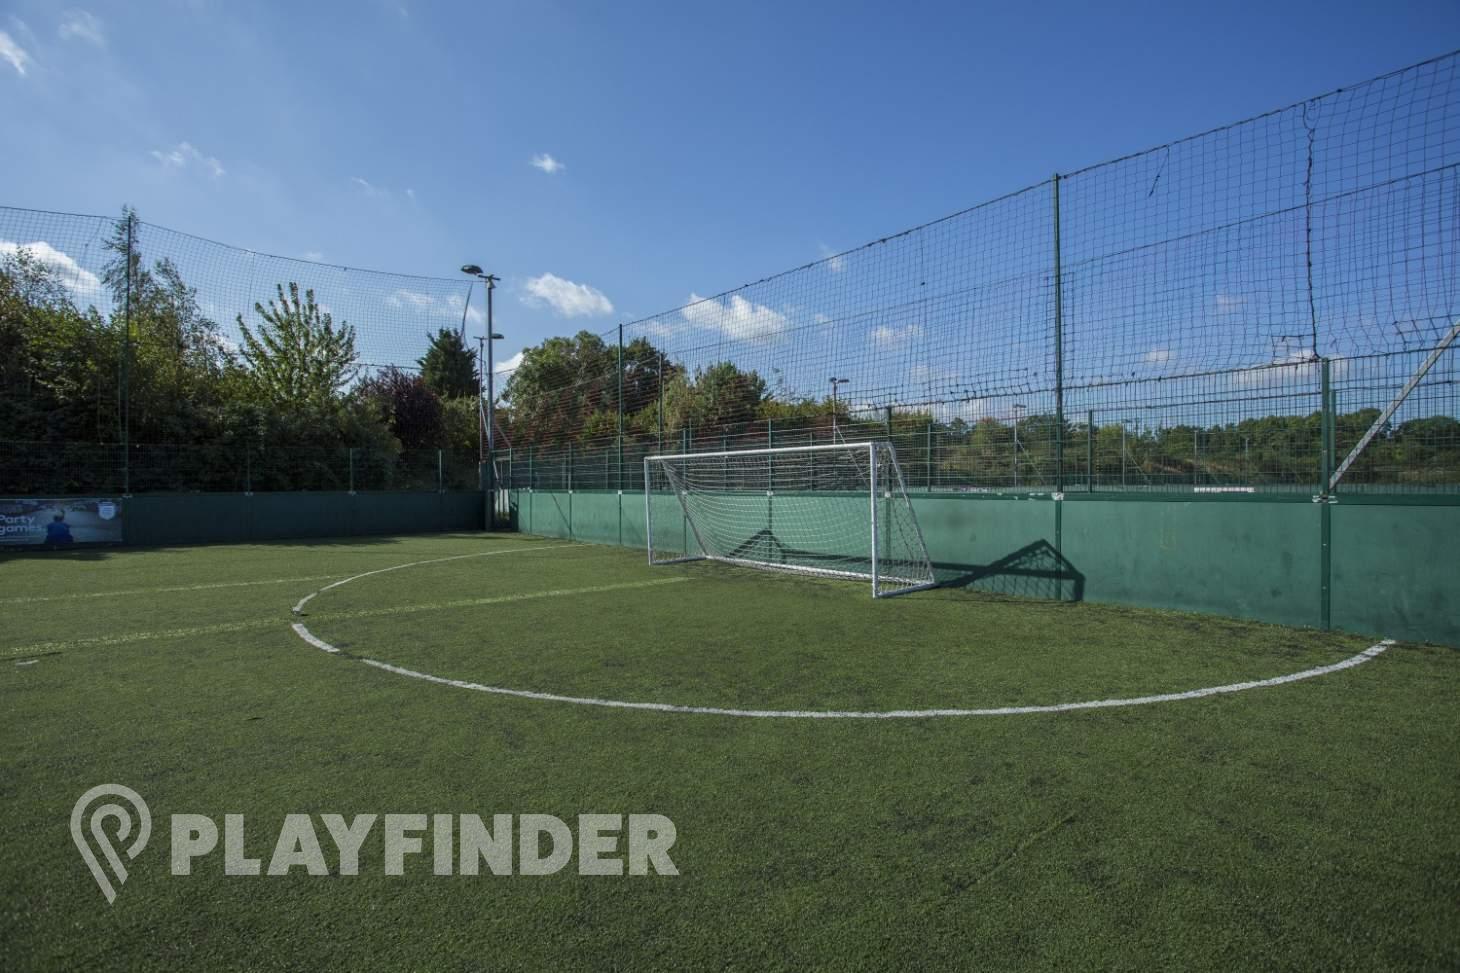 Powerleague Nottingham 5 a side | 3G Astroturf football pitch